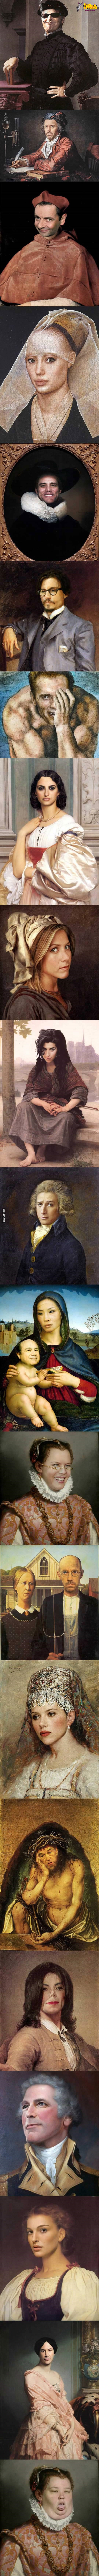 pinturas vlassicas